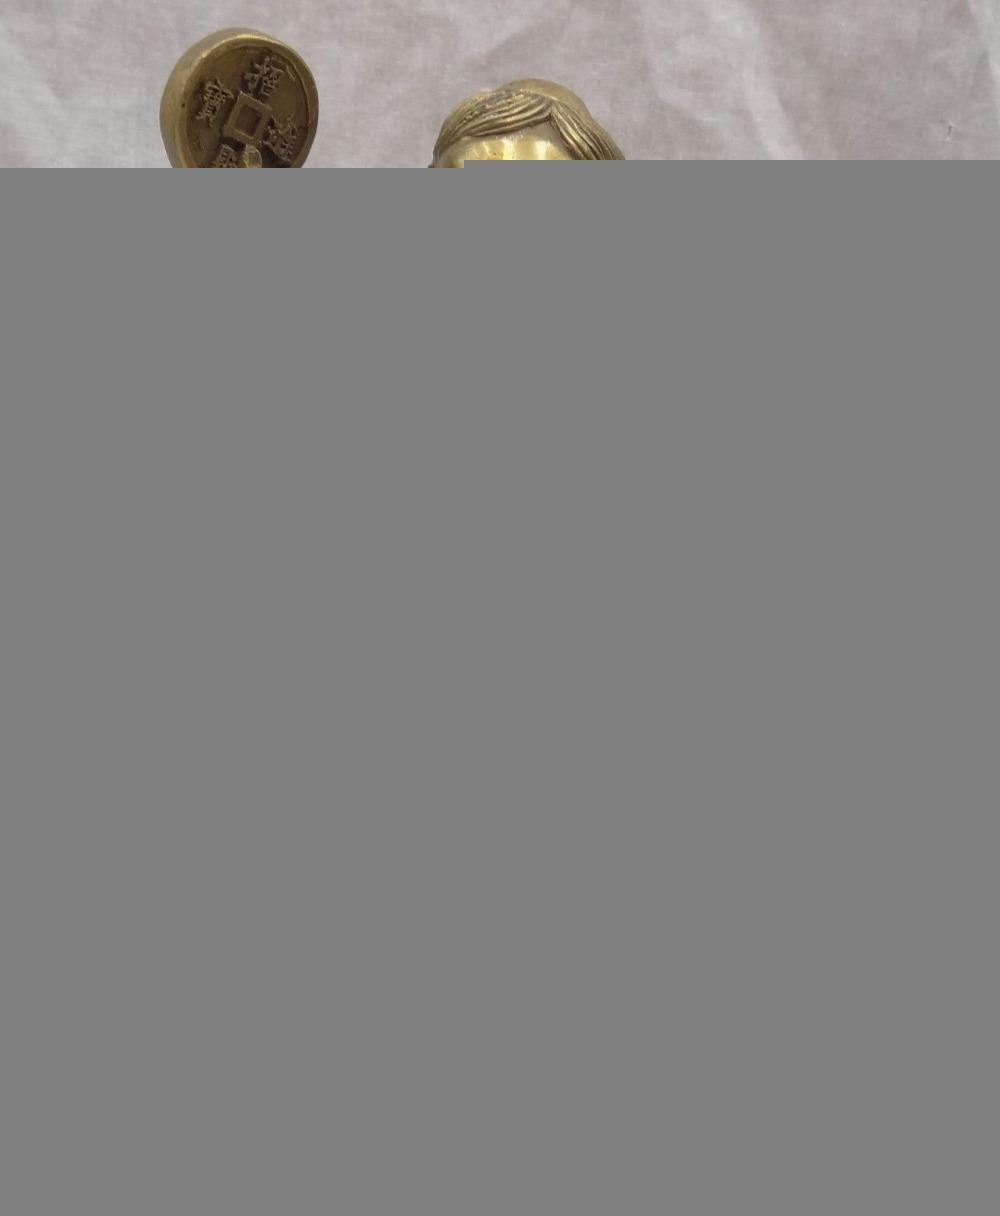 China Escultura de Bronce Riqueza Moneda Kid Niño LiHai Paseo Dorado Hoptoad Toad Estatua